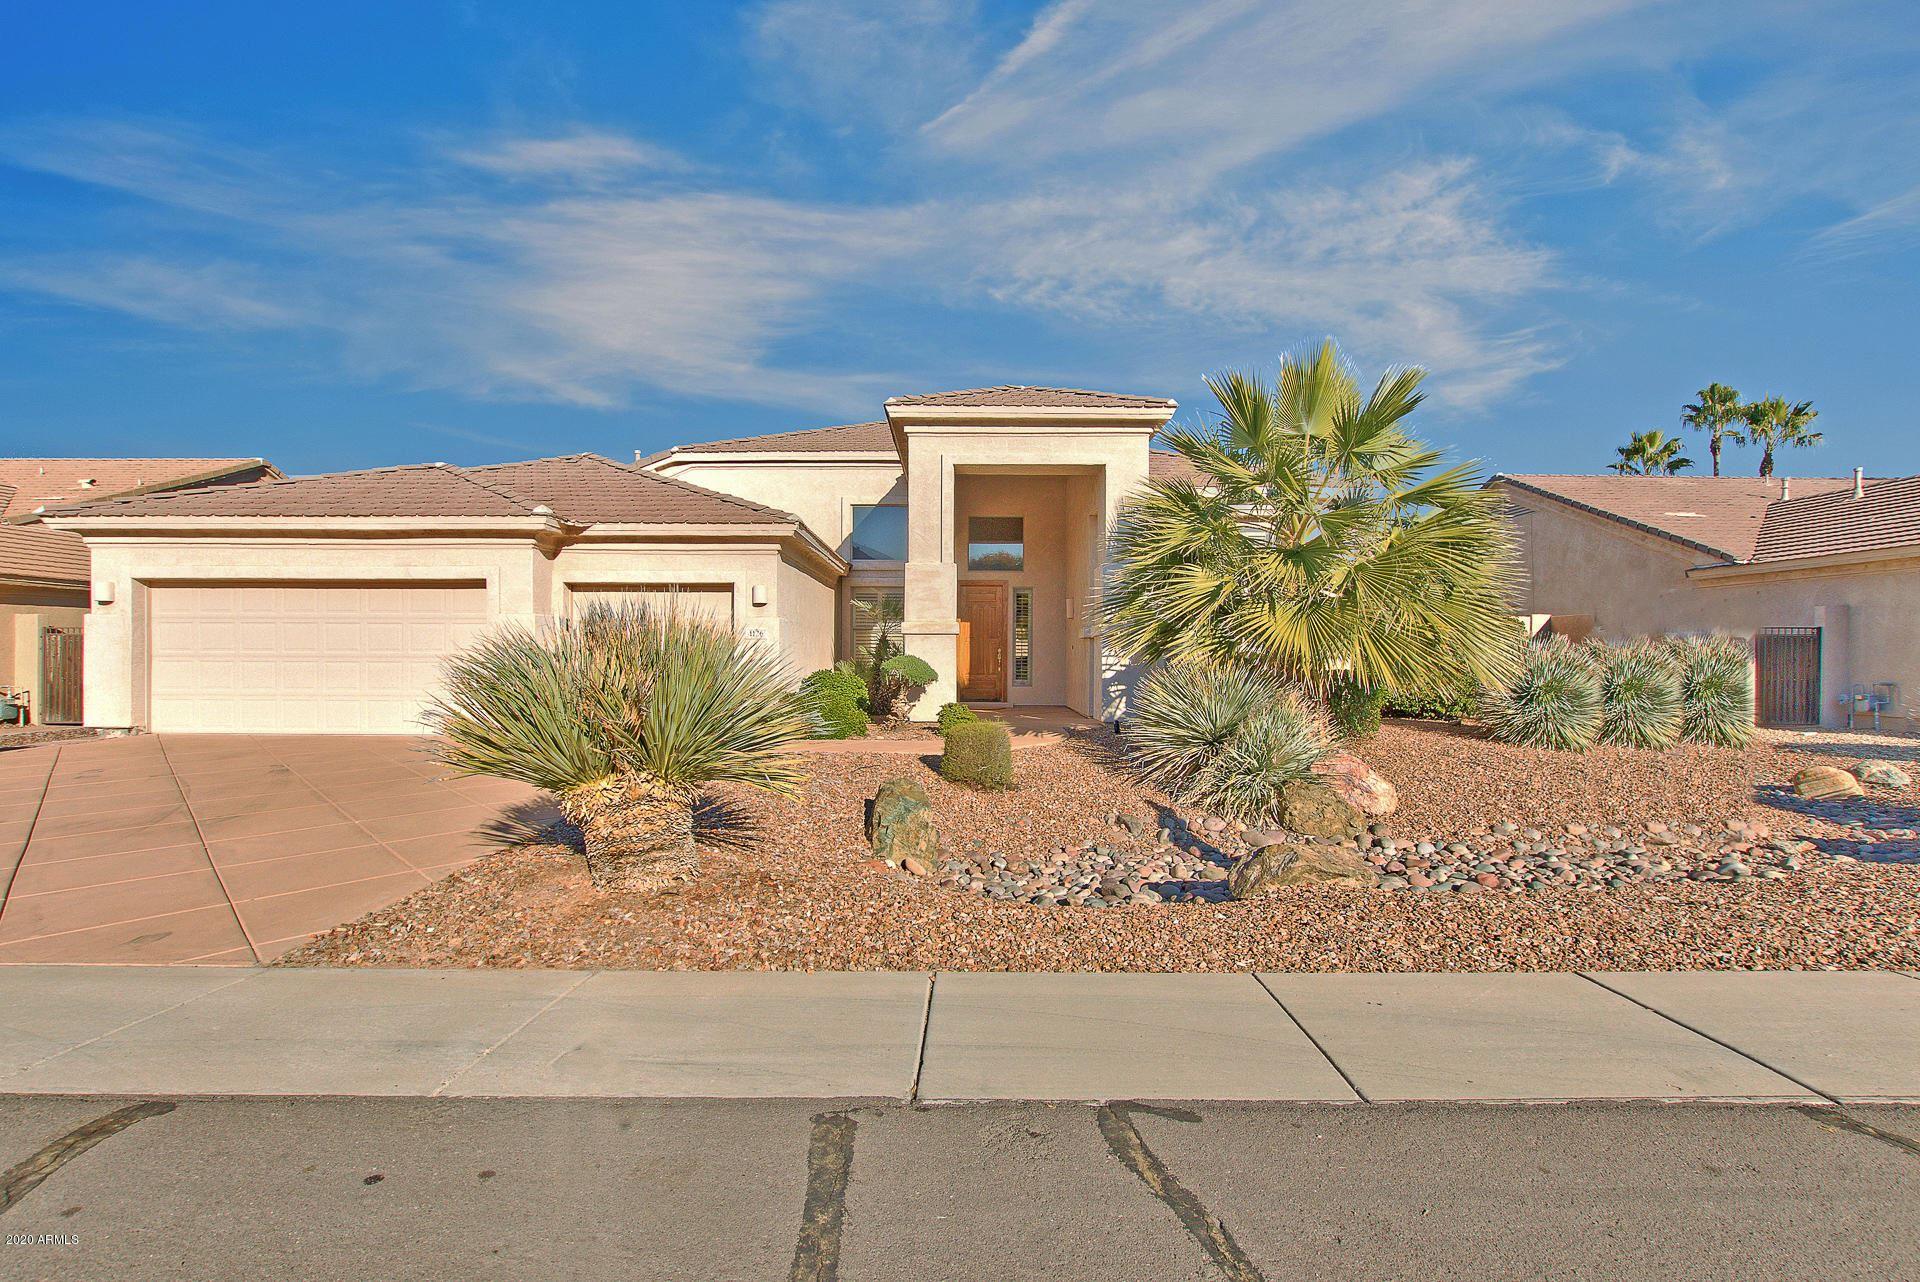 1126 W ARMSTRONG Way, Chandler, AZ 85286 - #: 6028810